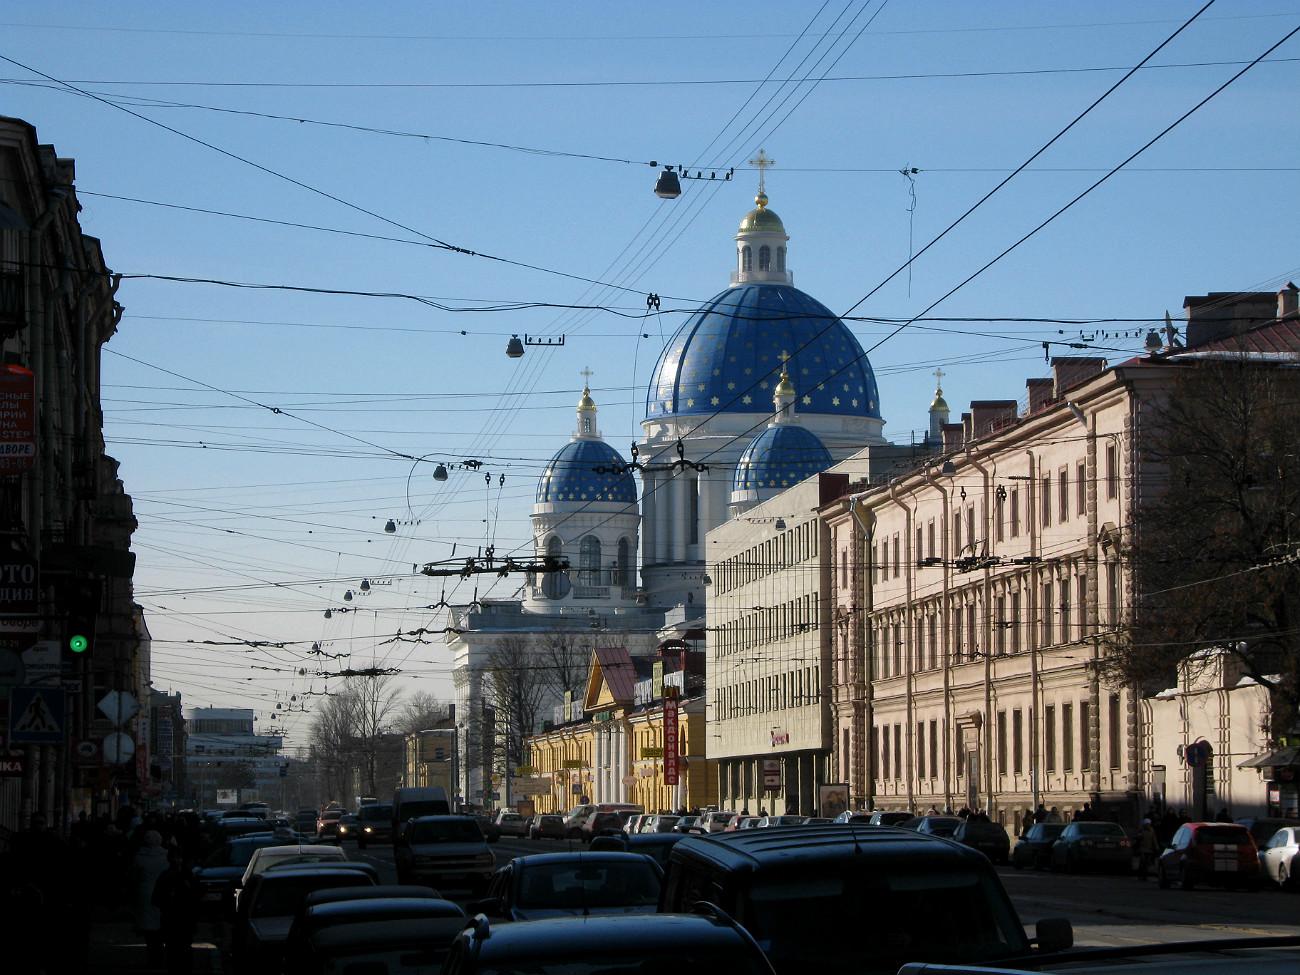 Le cupole della Cattedrale. Fonte: Georgij Dolgopskij